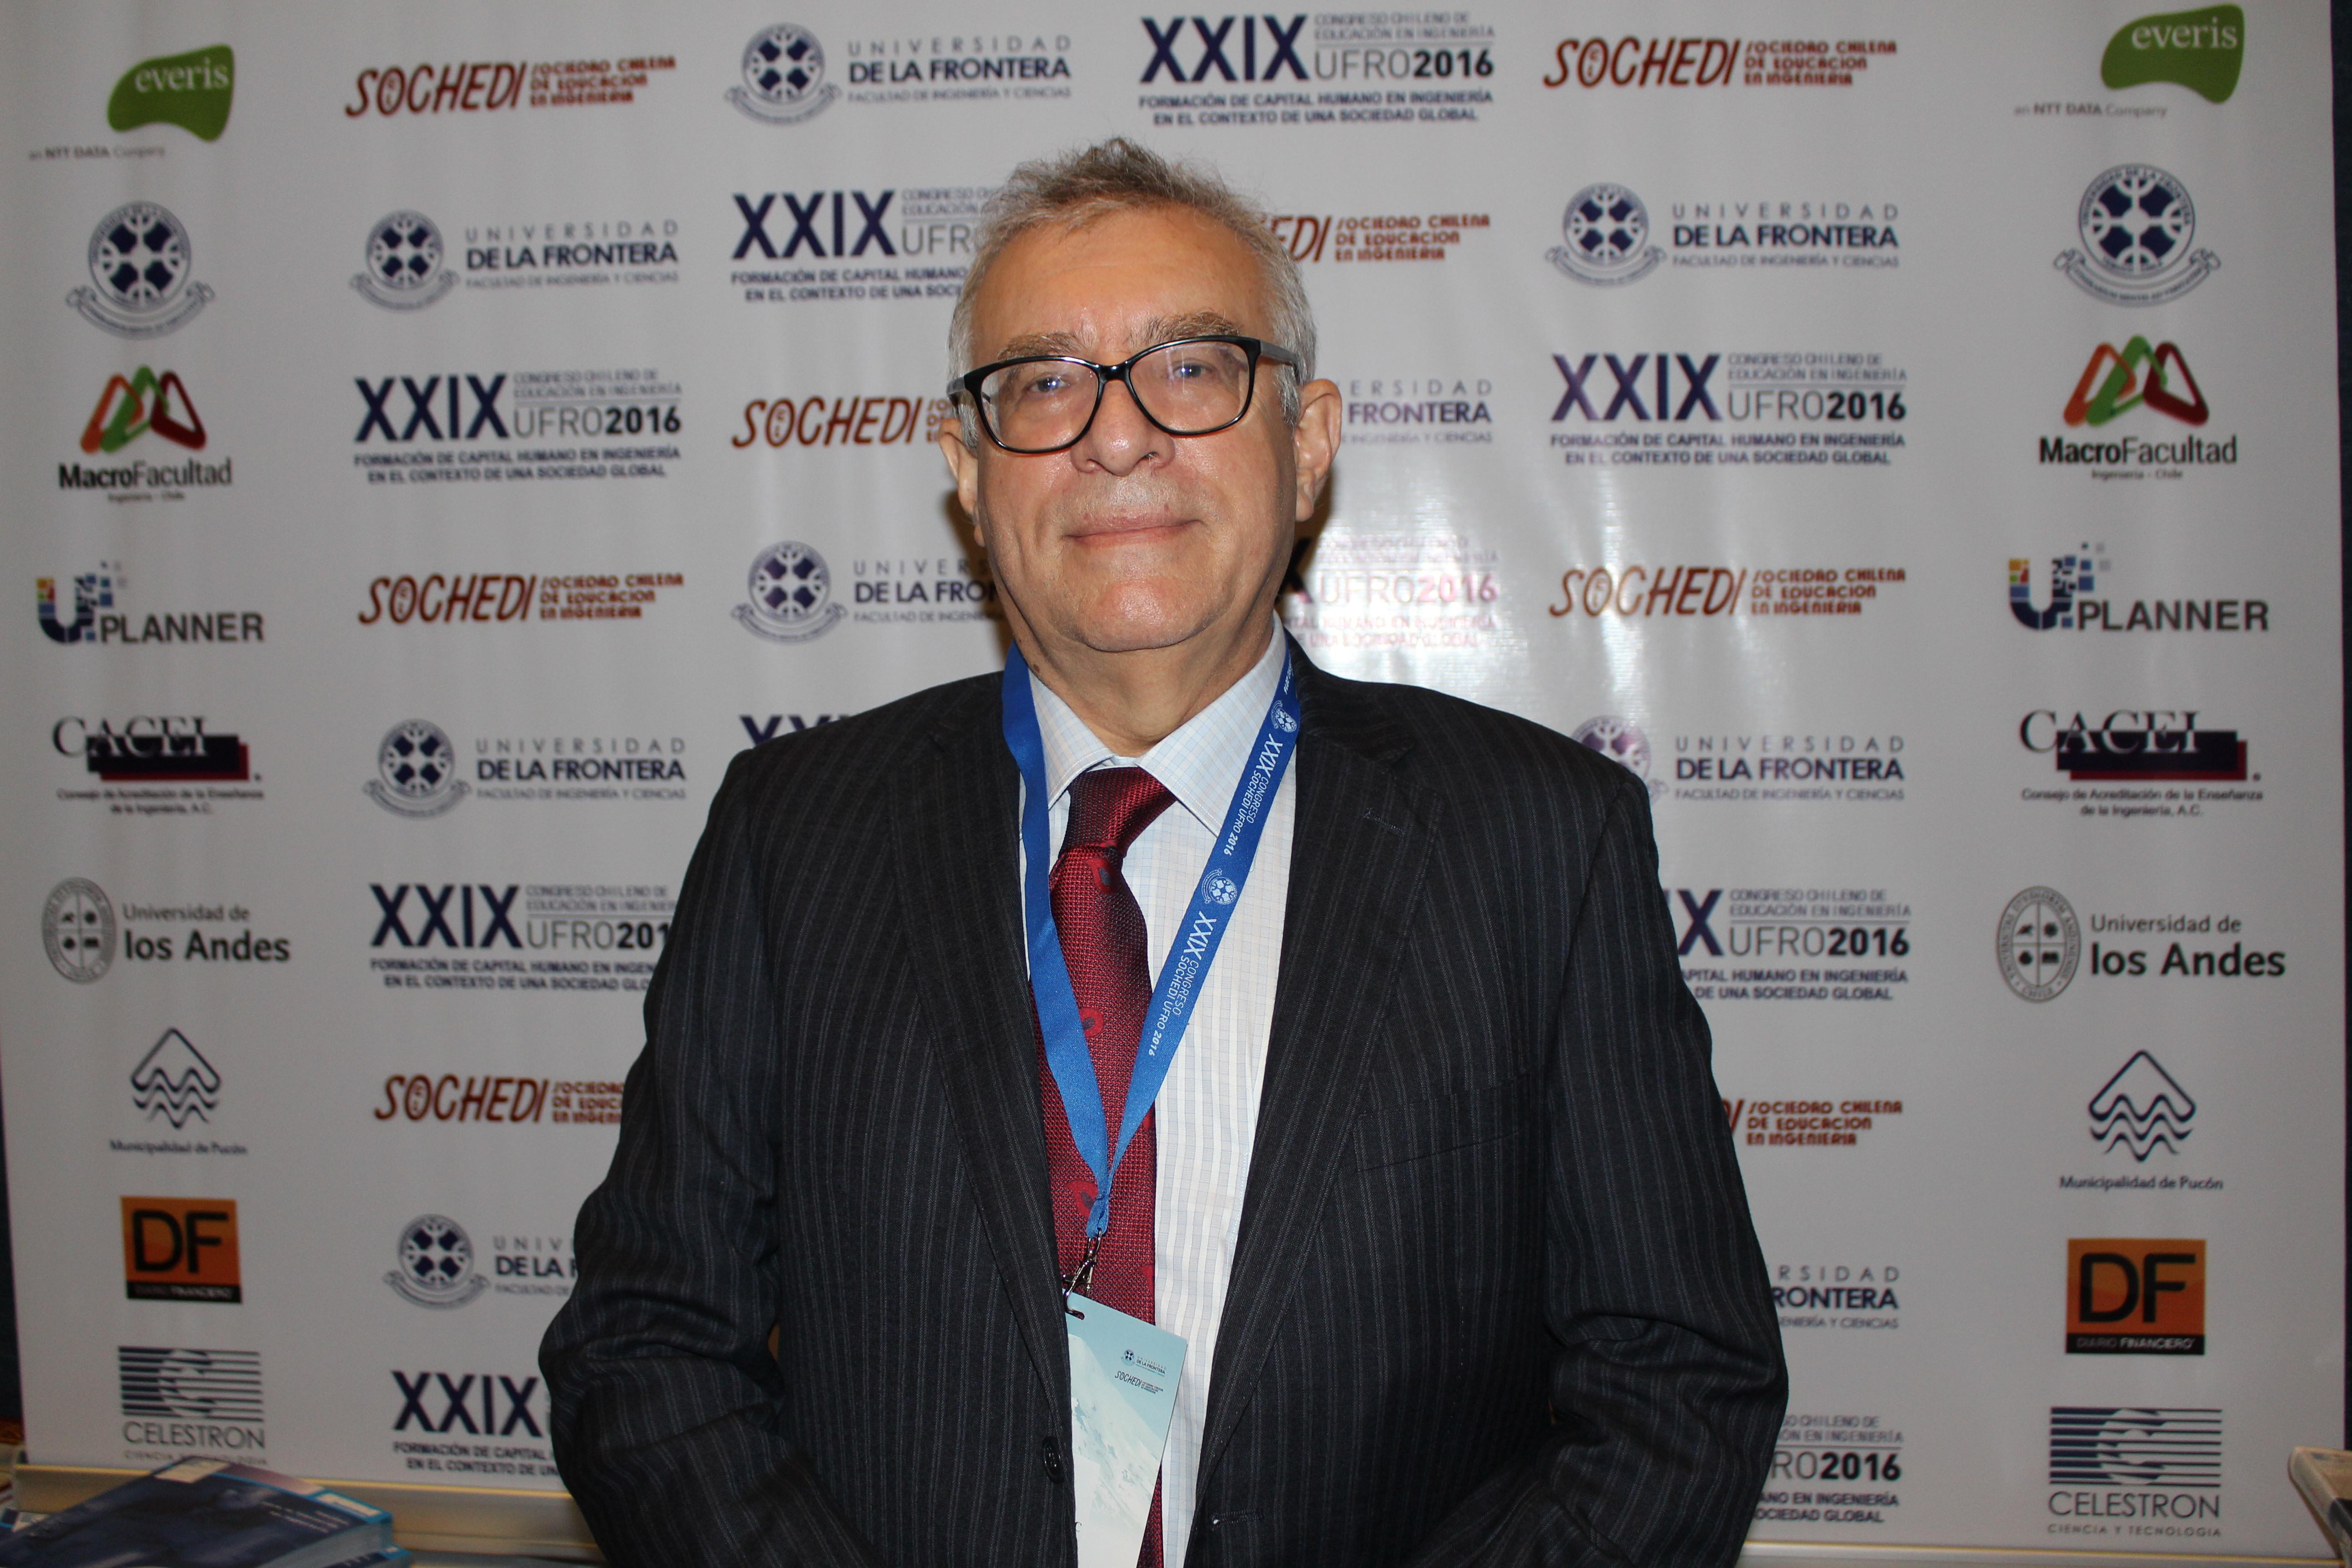 Jorge Yutronic, Senior Consultant U-Planner